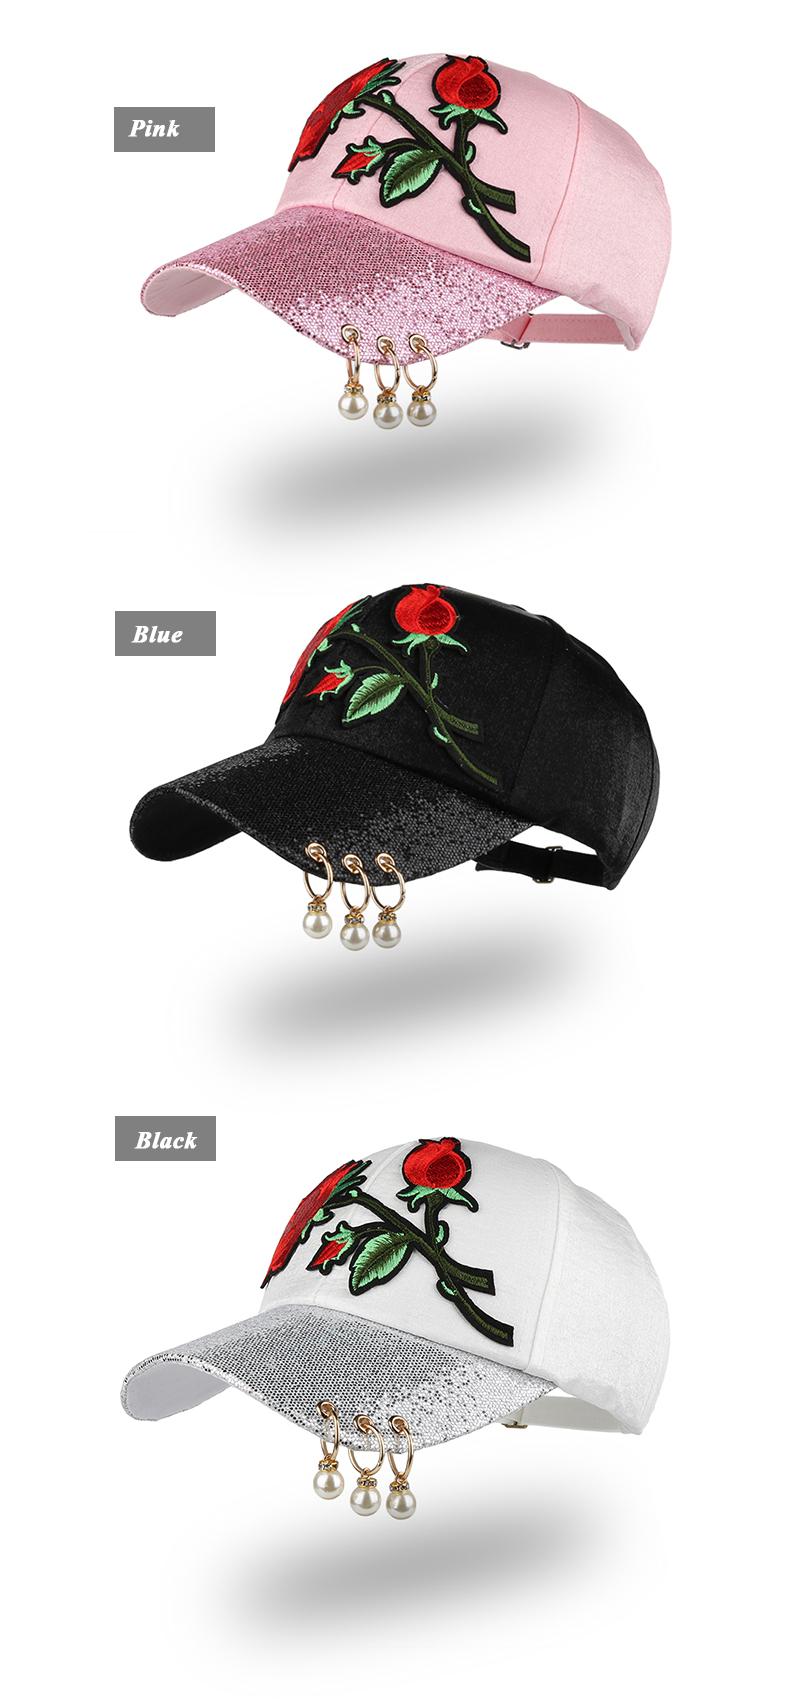 Embroidered Rose Baseball Cap - Pink Cap, Black Cap and White Cap